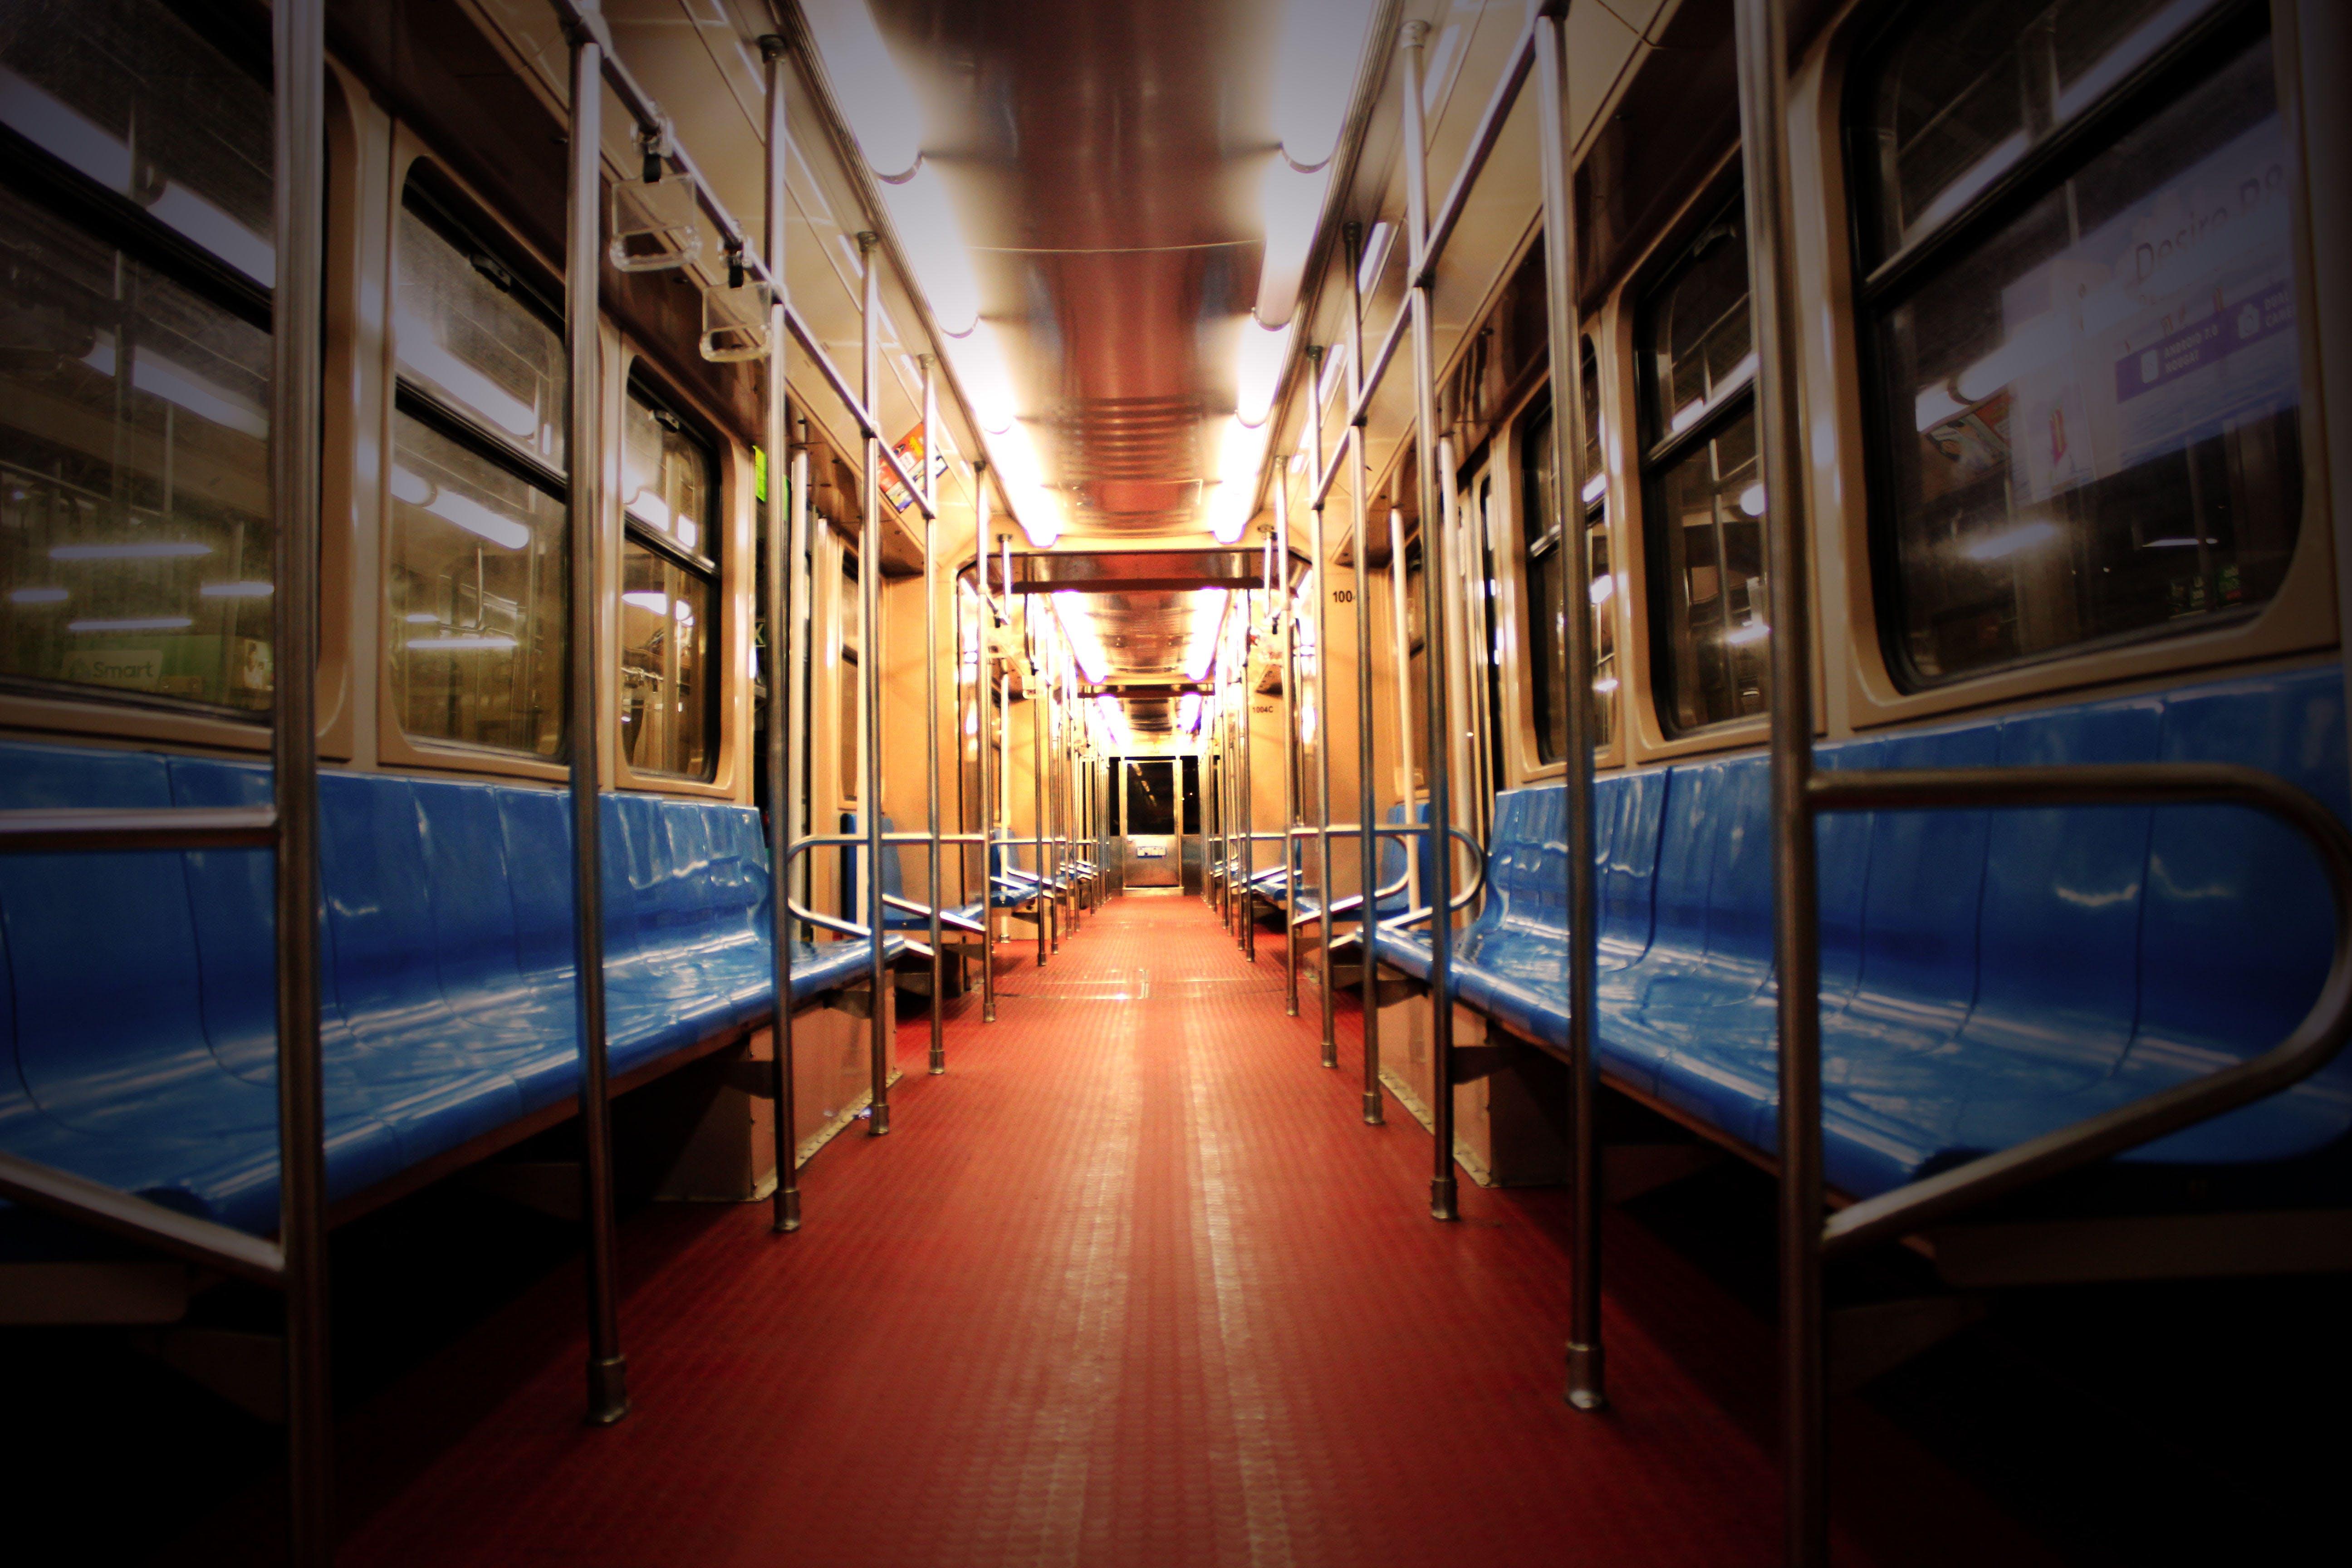 Free stock photo of train, transportation, Philippines, manila